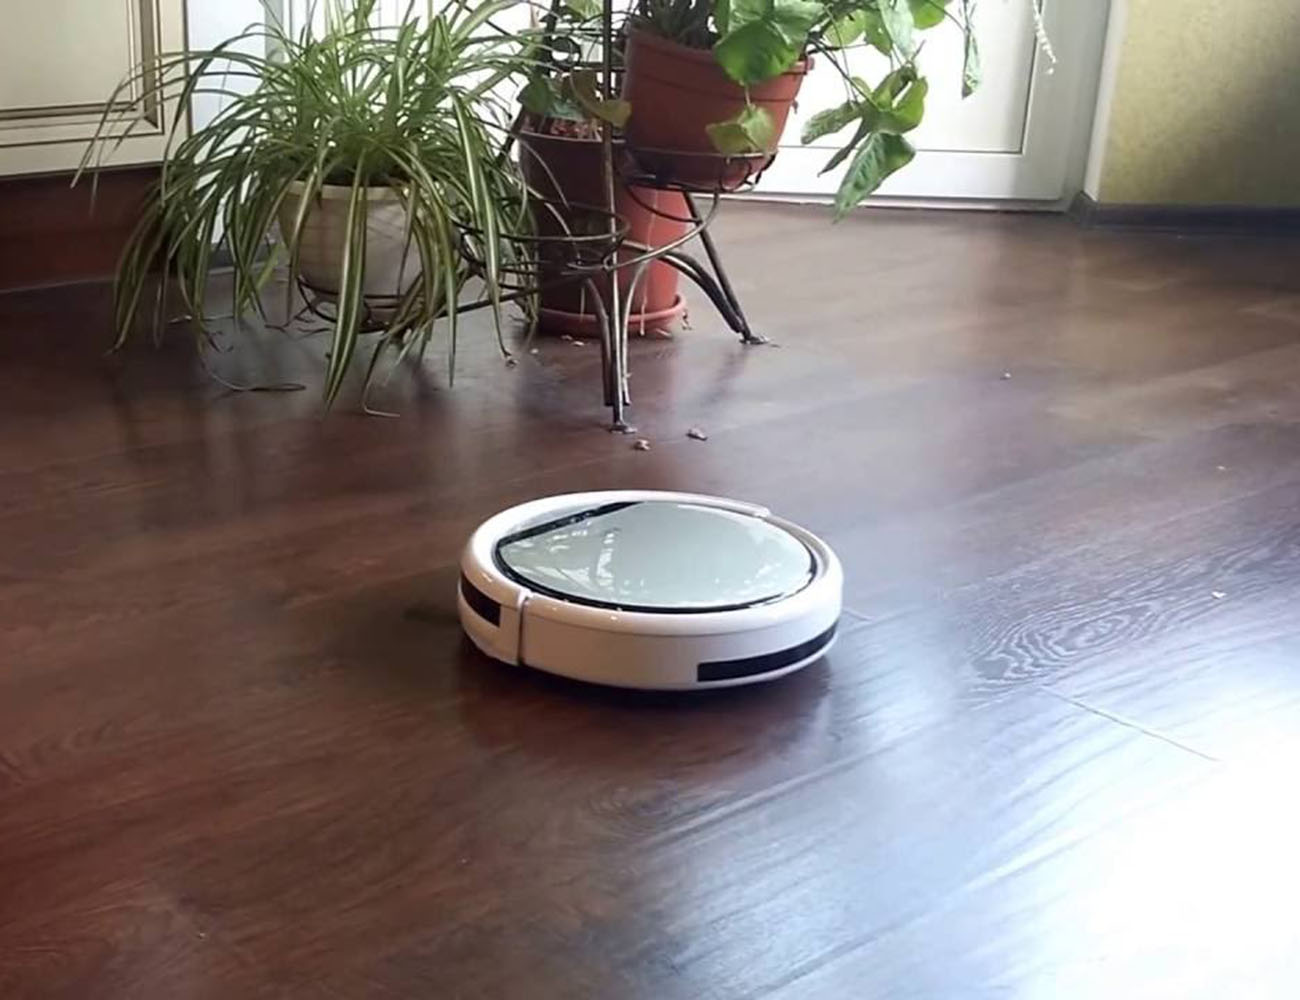 Chuwi Ilife V5 Pro Intelligent Robotic Vacuum Cleaner